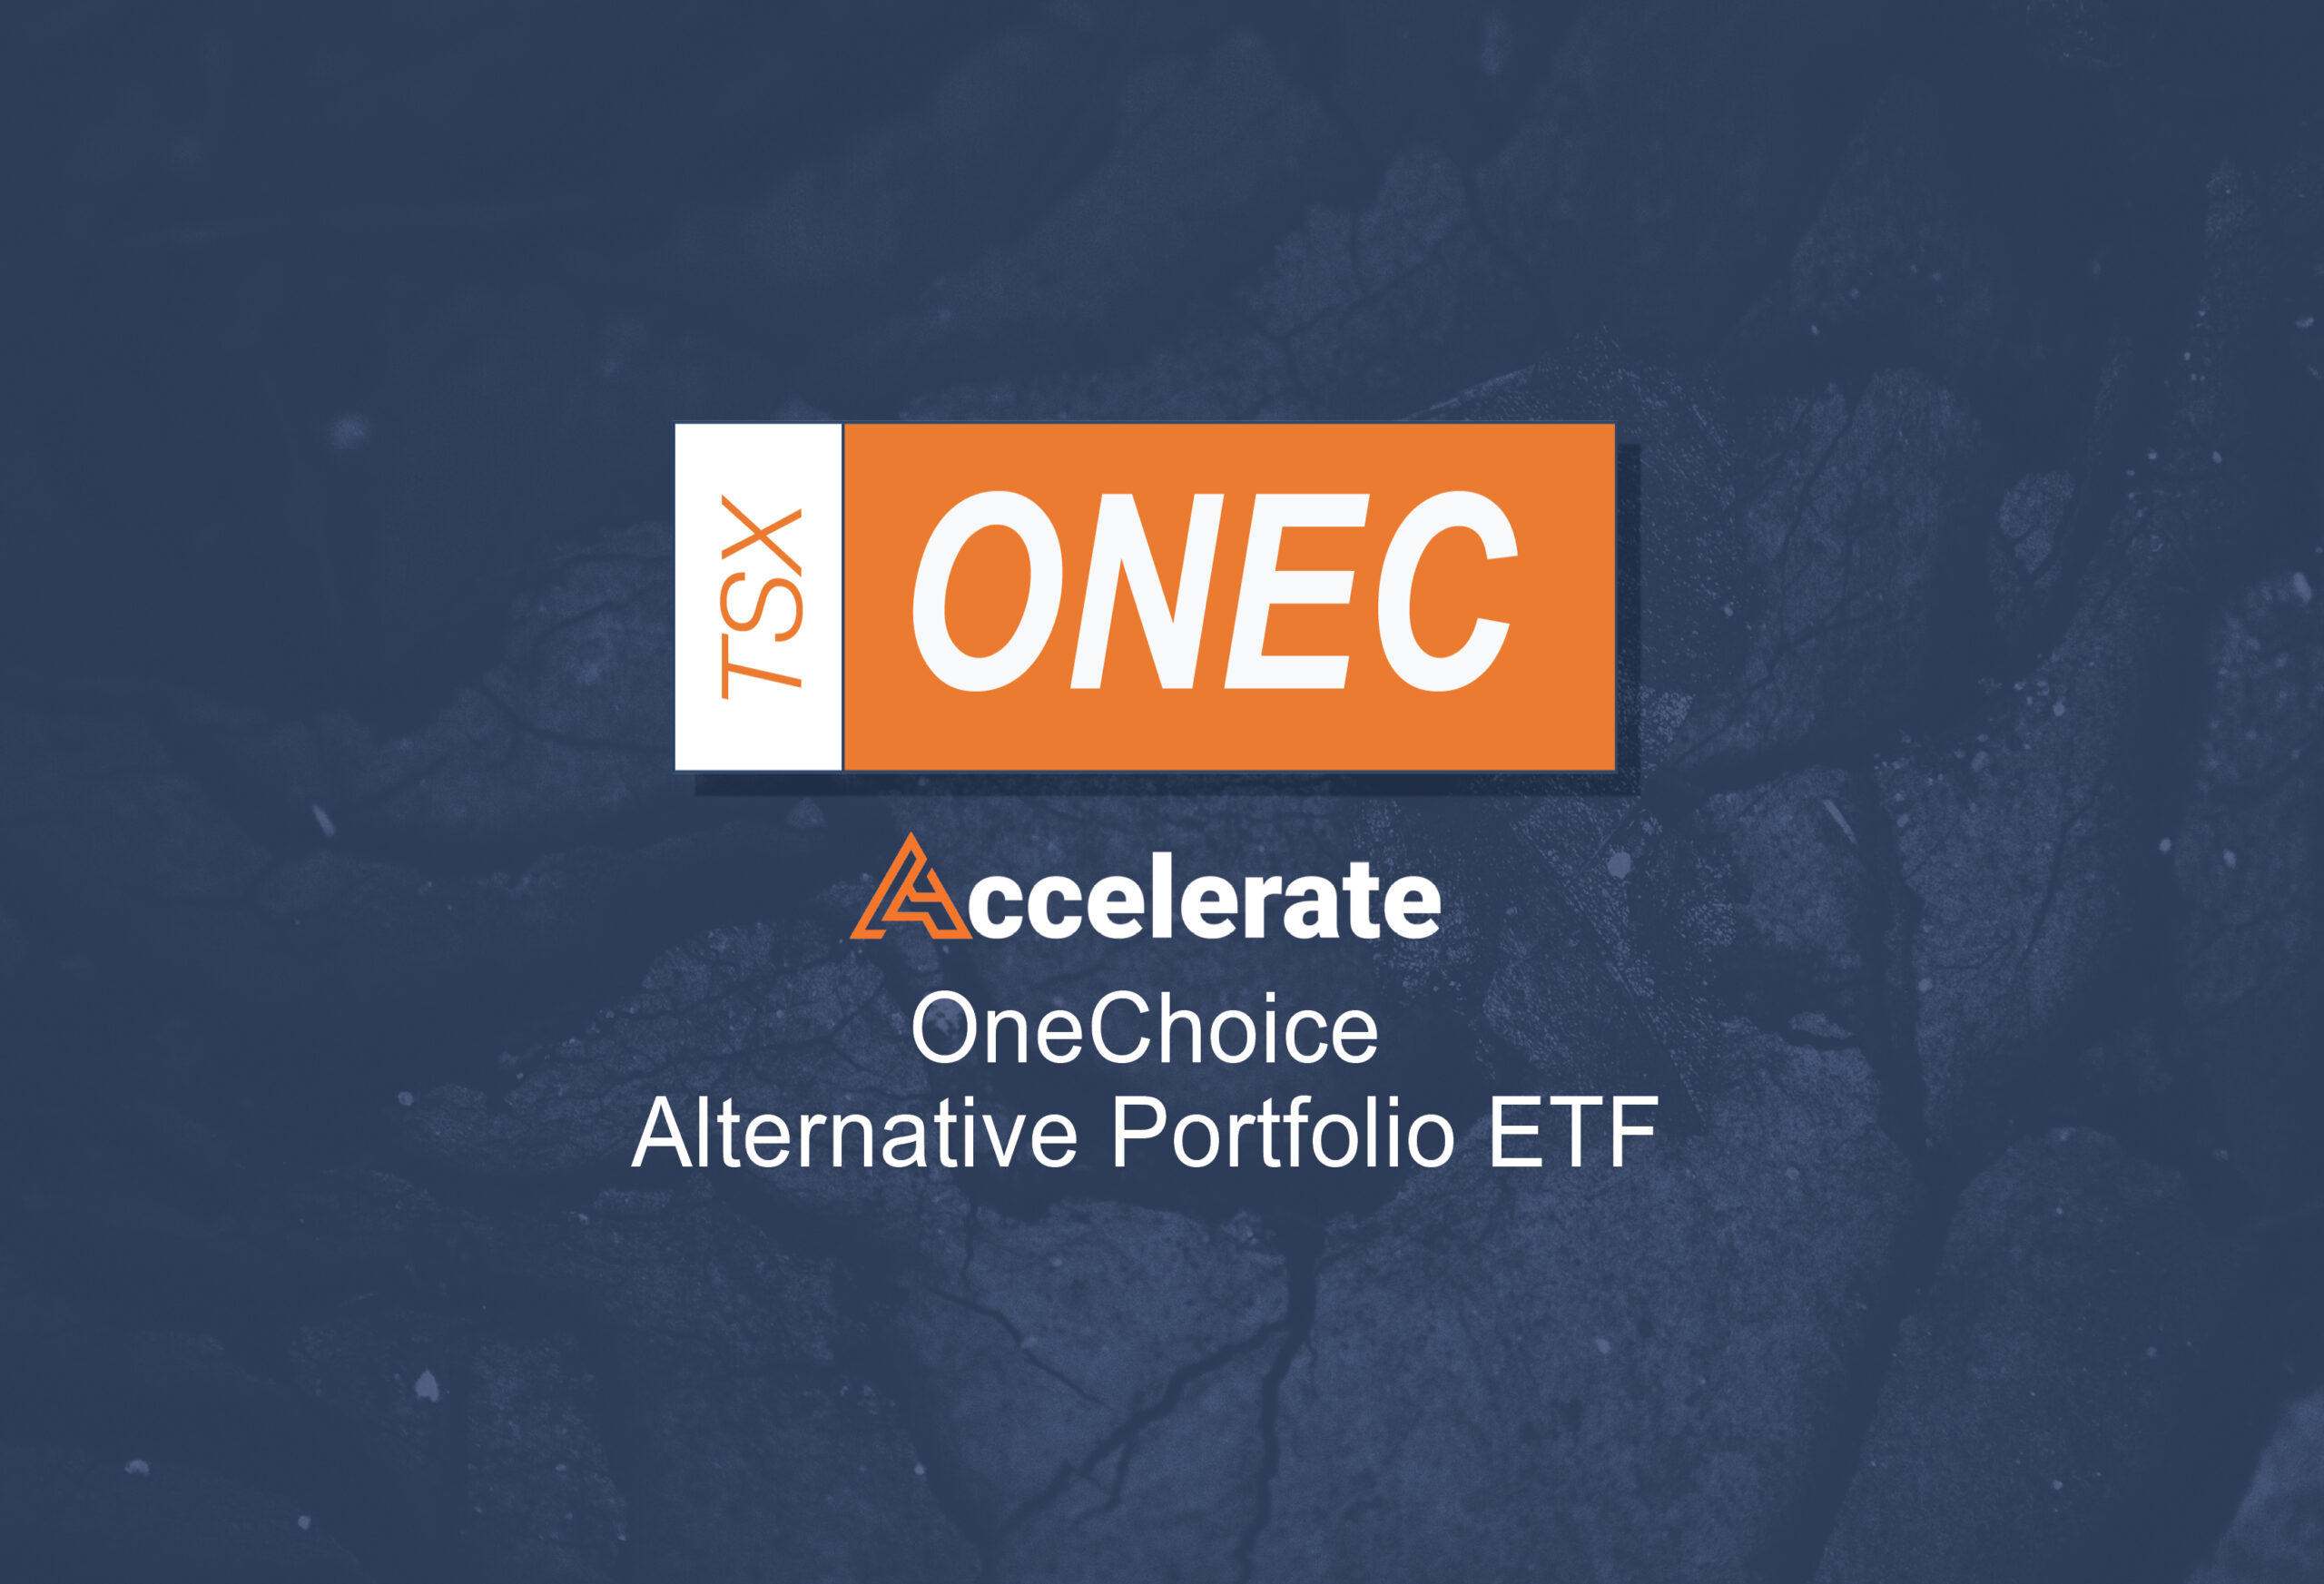 Accelerate Announces OneChoice Alternative Portfolio ETF